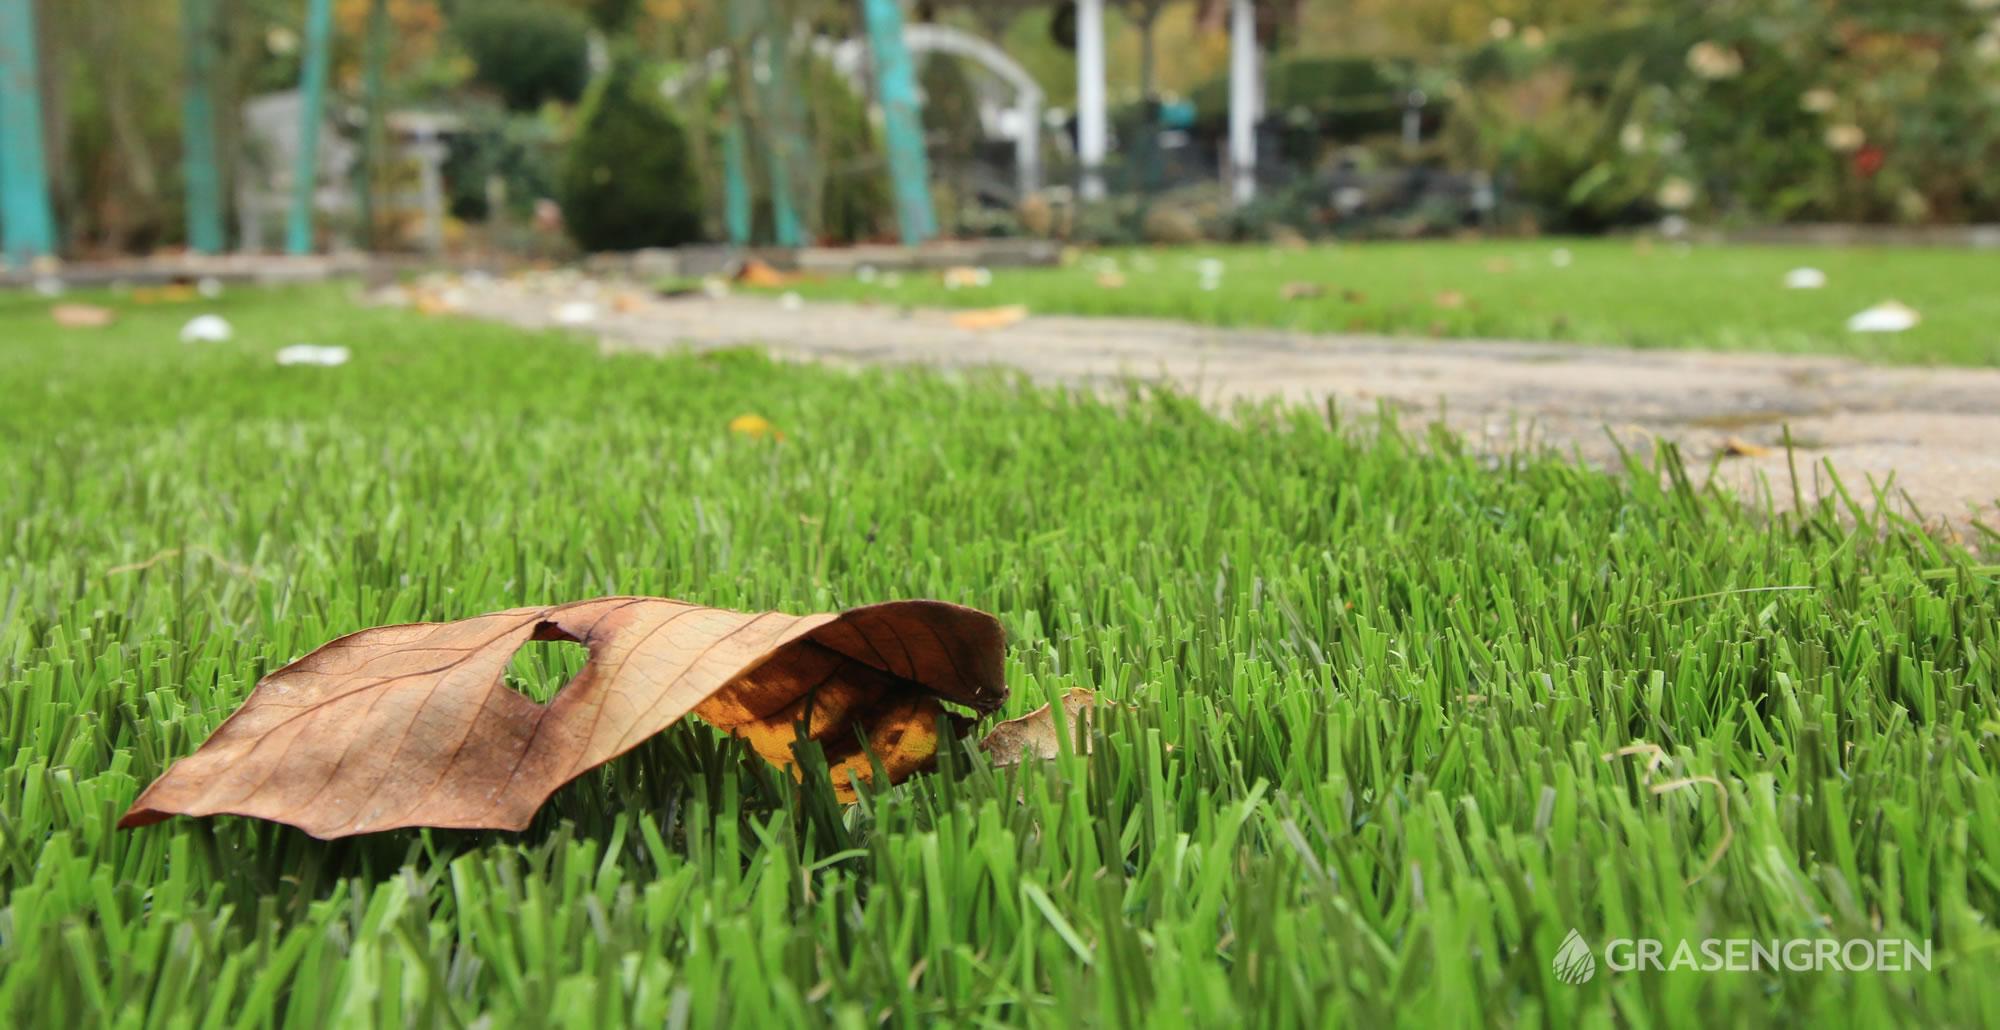 Kunstgrasleggensintjoriswinge14 • Gras en Groen Kunstgras